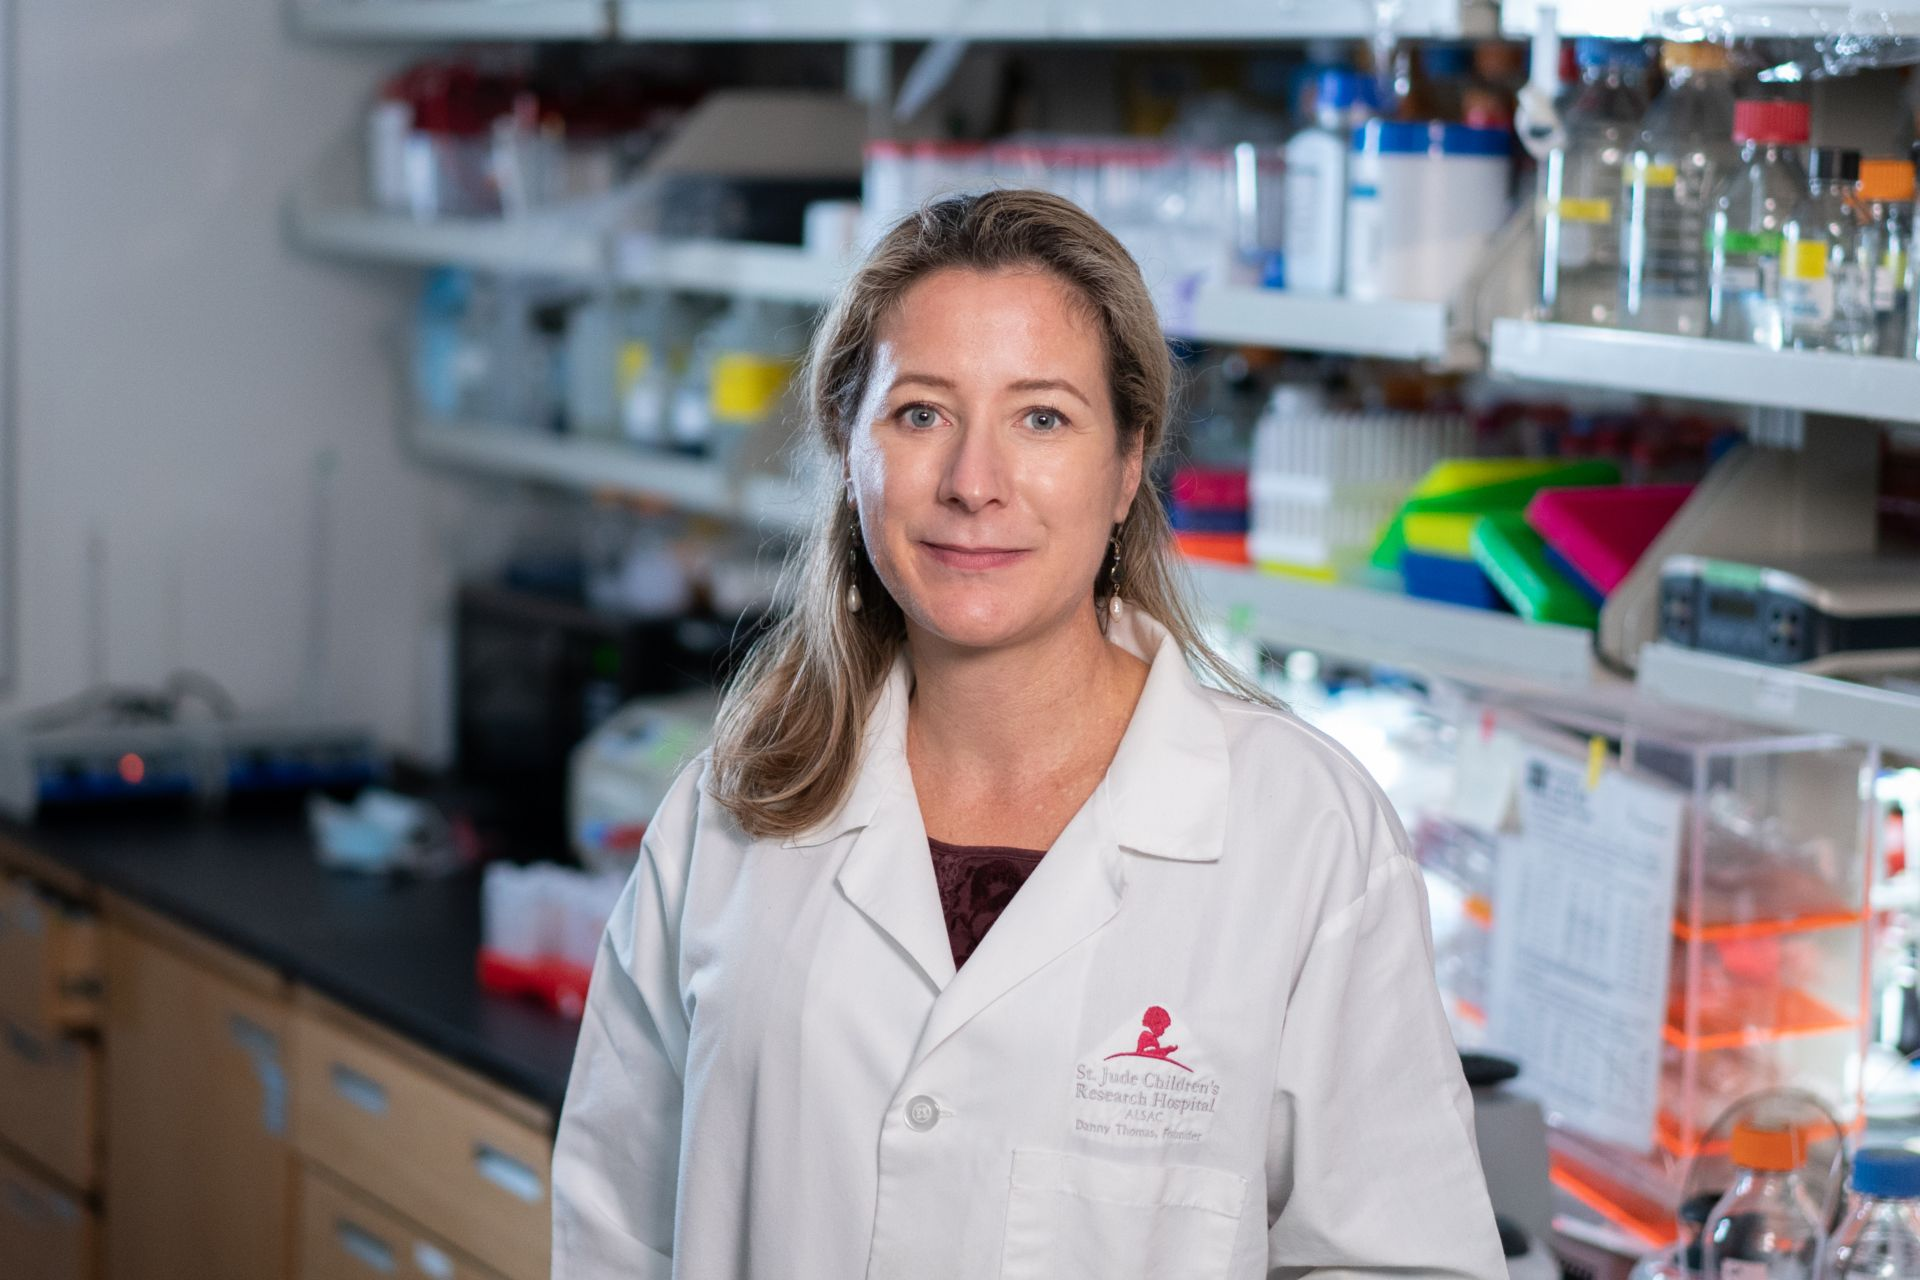 Cristina Guibao, PhD